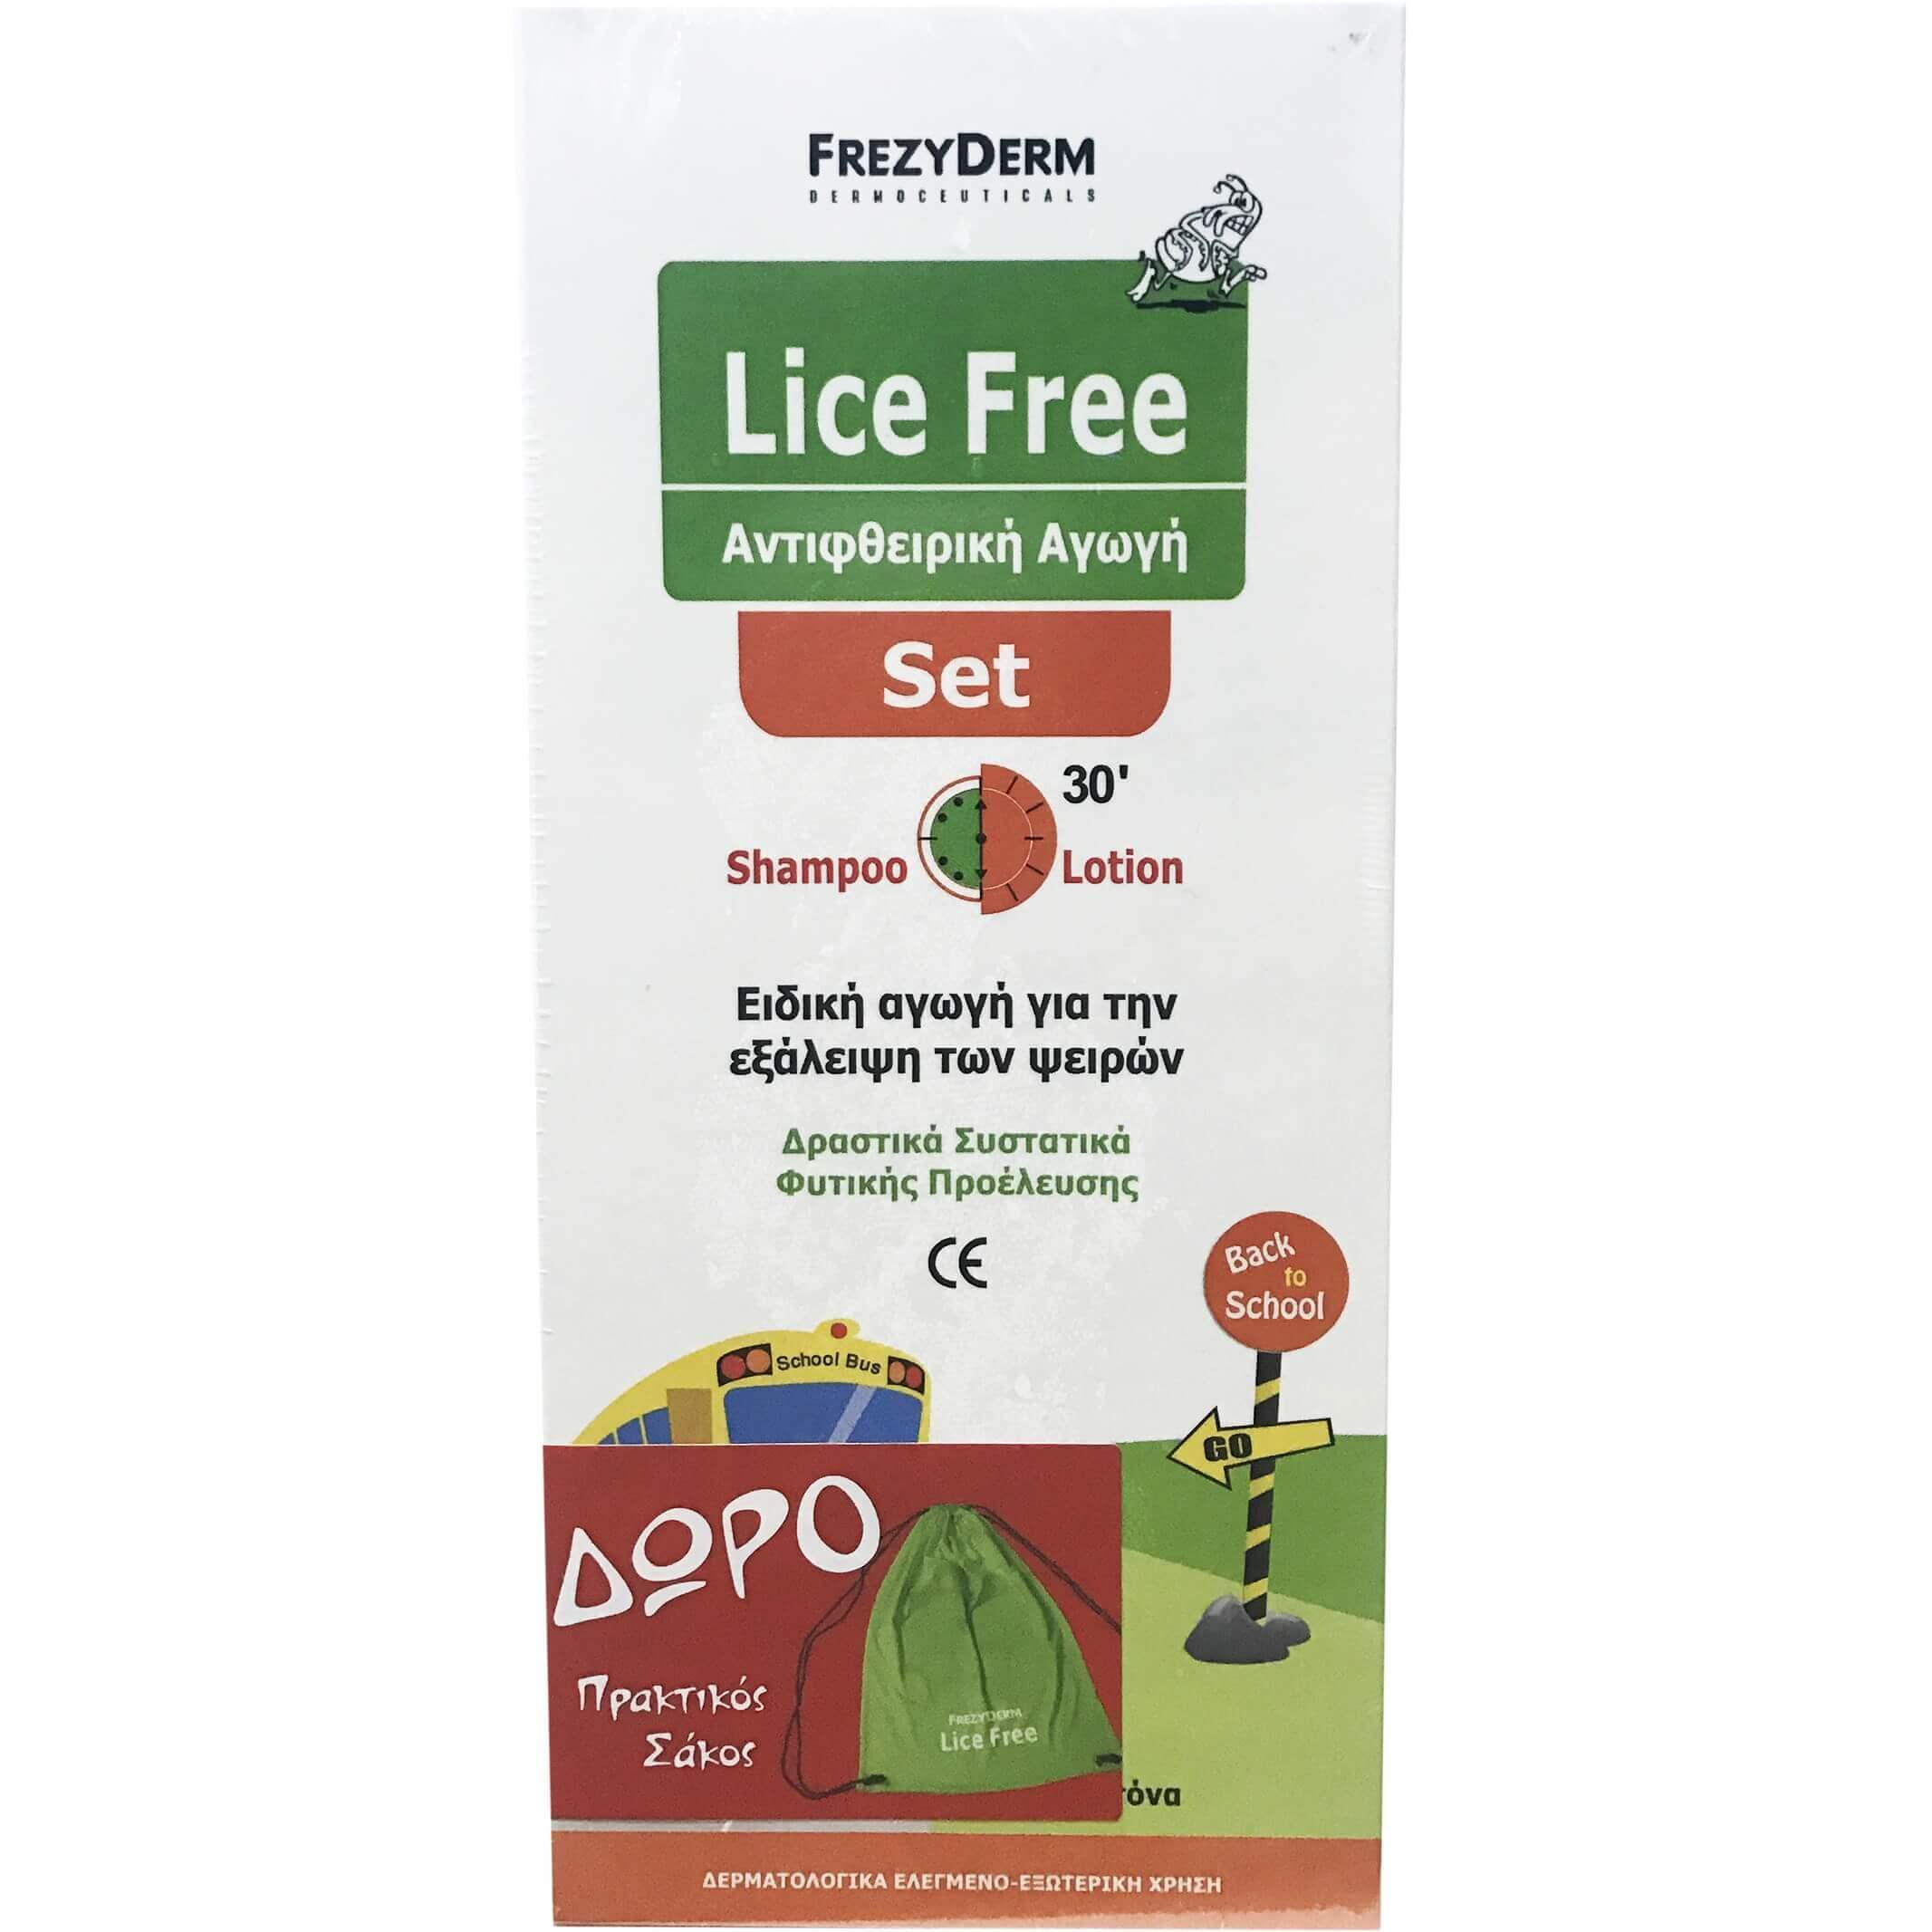 Frezyderm Πακέτο Προσφοράς Lice Free Set Shampoo & Lotion Αντιφθειρική Αγωγή 2x125ml & Δώρο Πρακτικός Σάκος